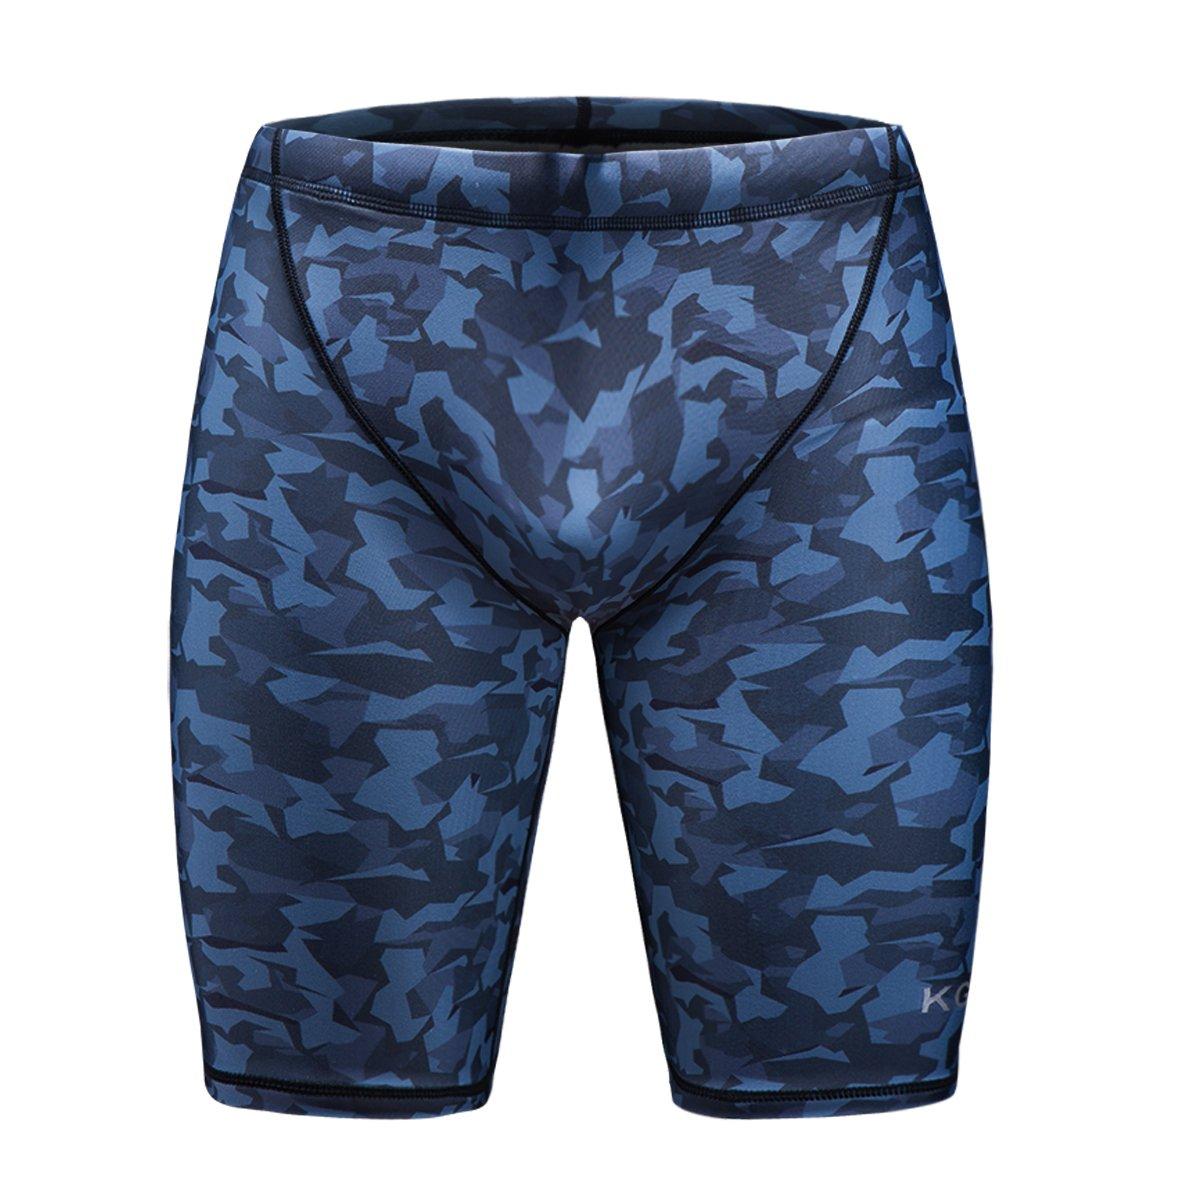 35989009e2 KGKE Men's Swim Jammers Compression Fashion Print Jammer Swimsuit Swim  Boxer Long product image